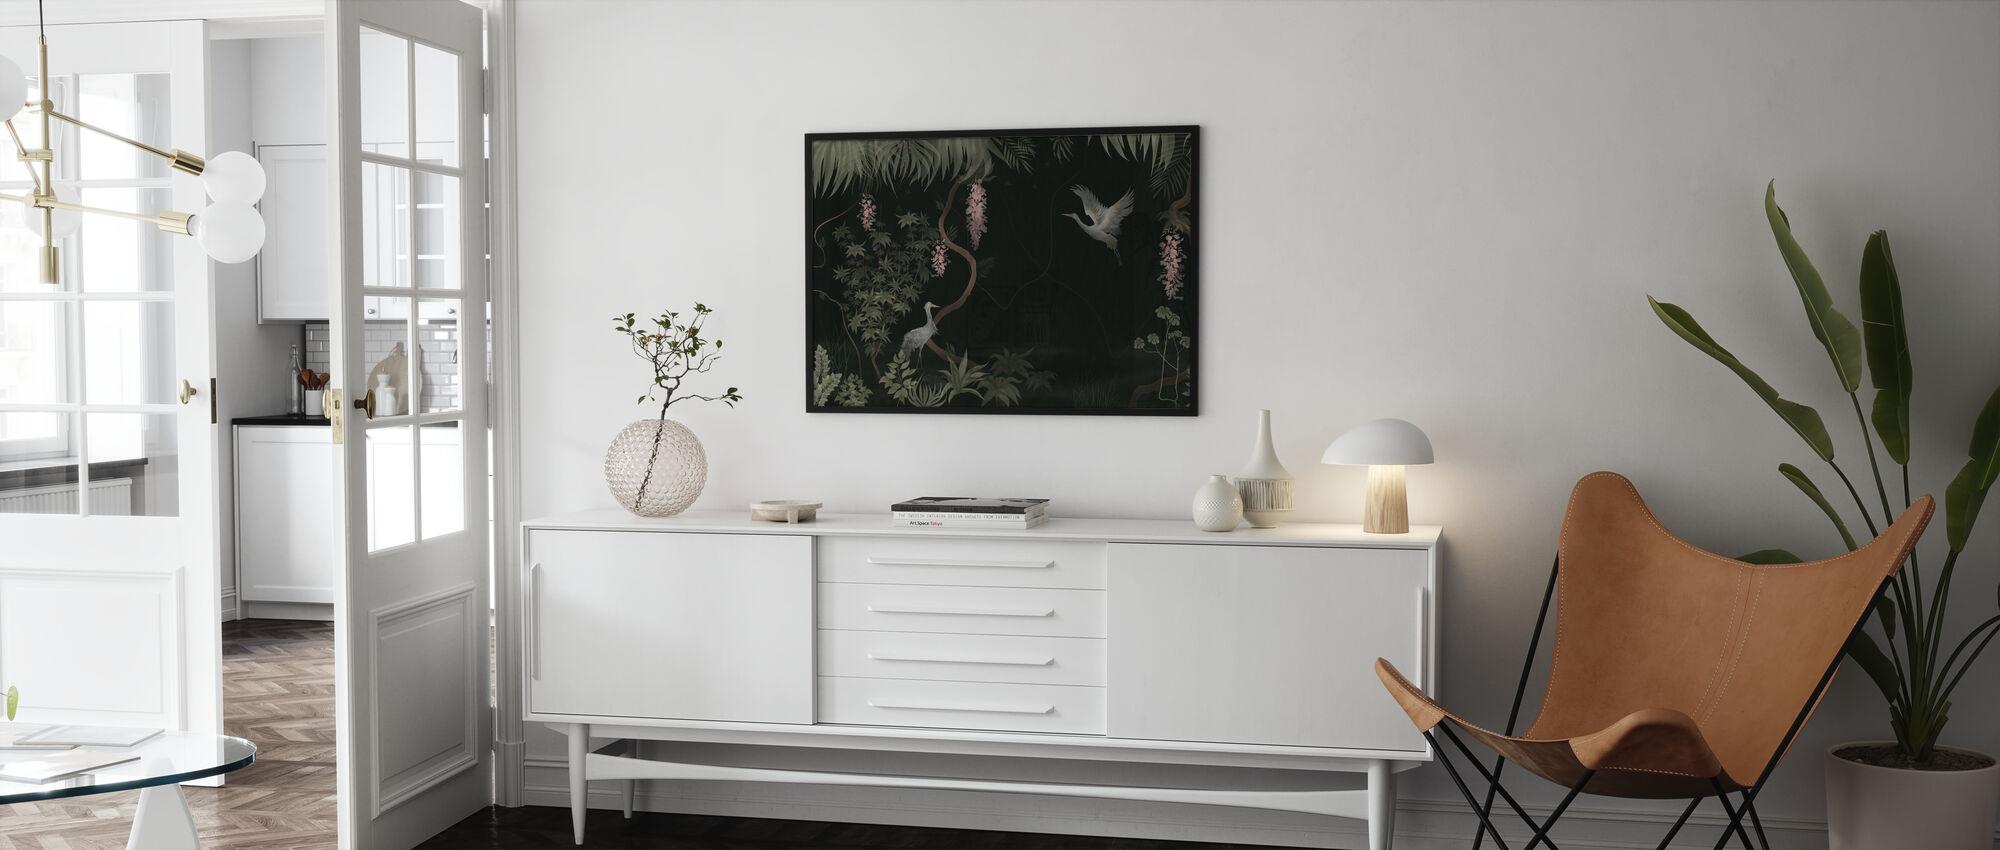 Rustig landschap - Donkere Salie - Ingelijste print - Woonkamer